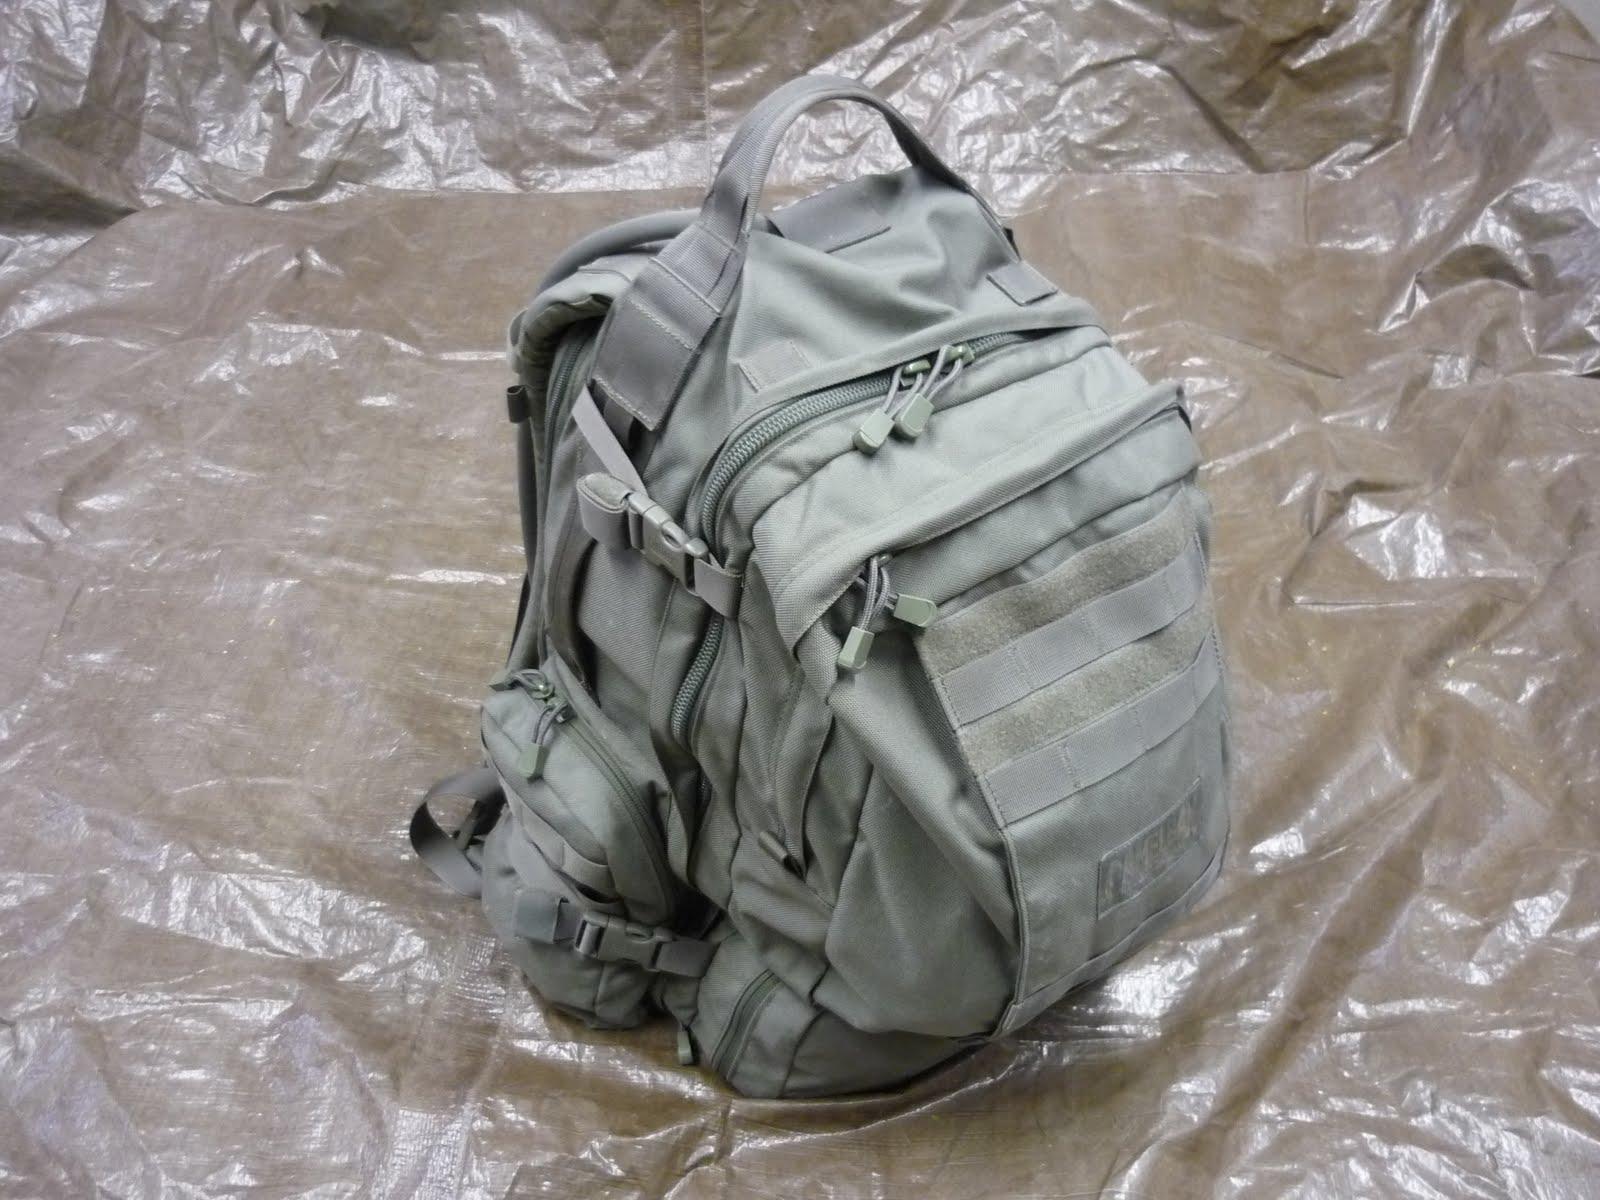 Lesurvivaliste bug out bag - Sac d evacuation ...